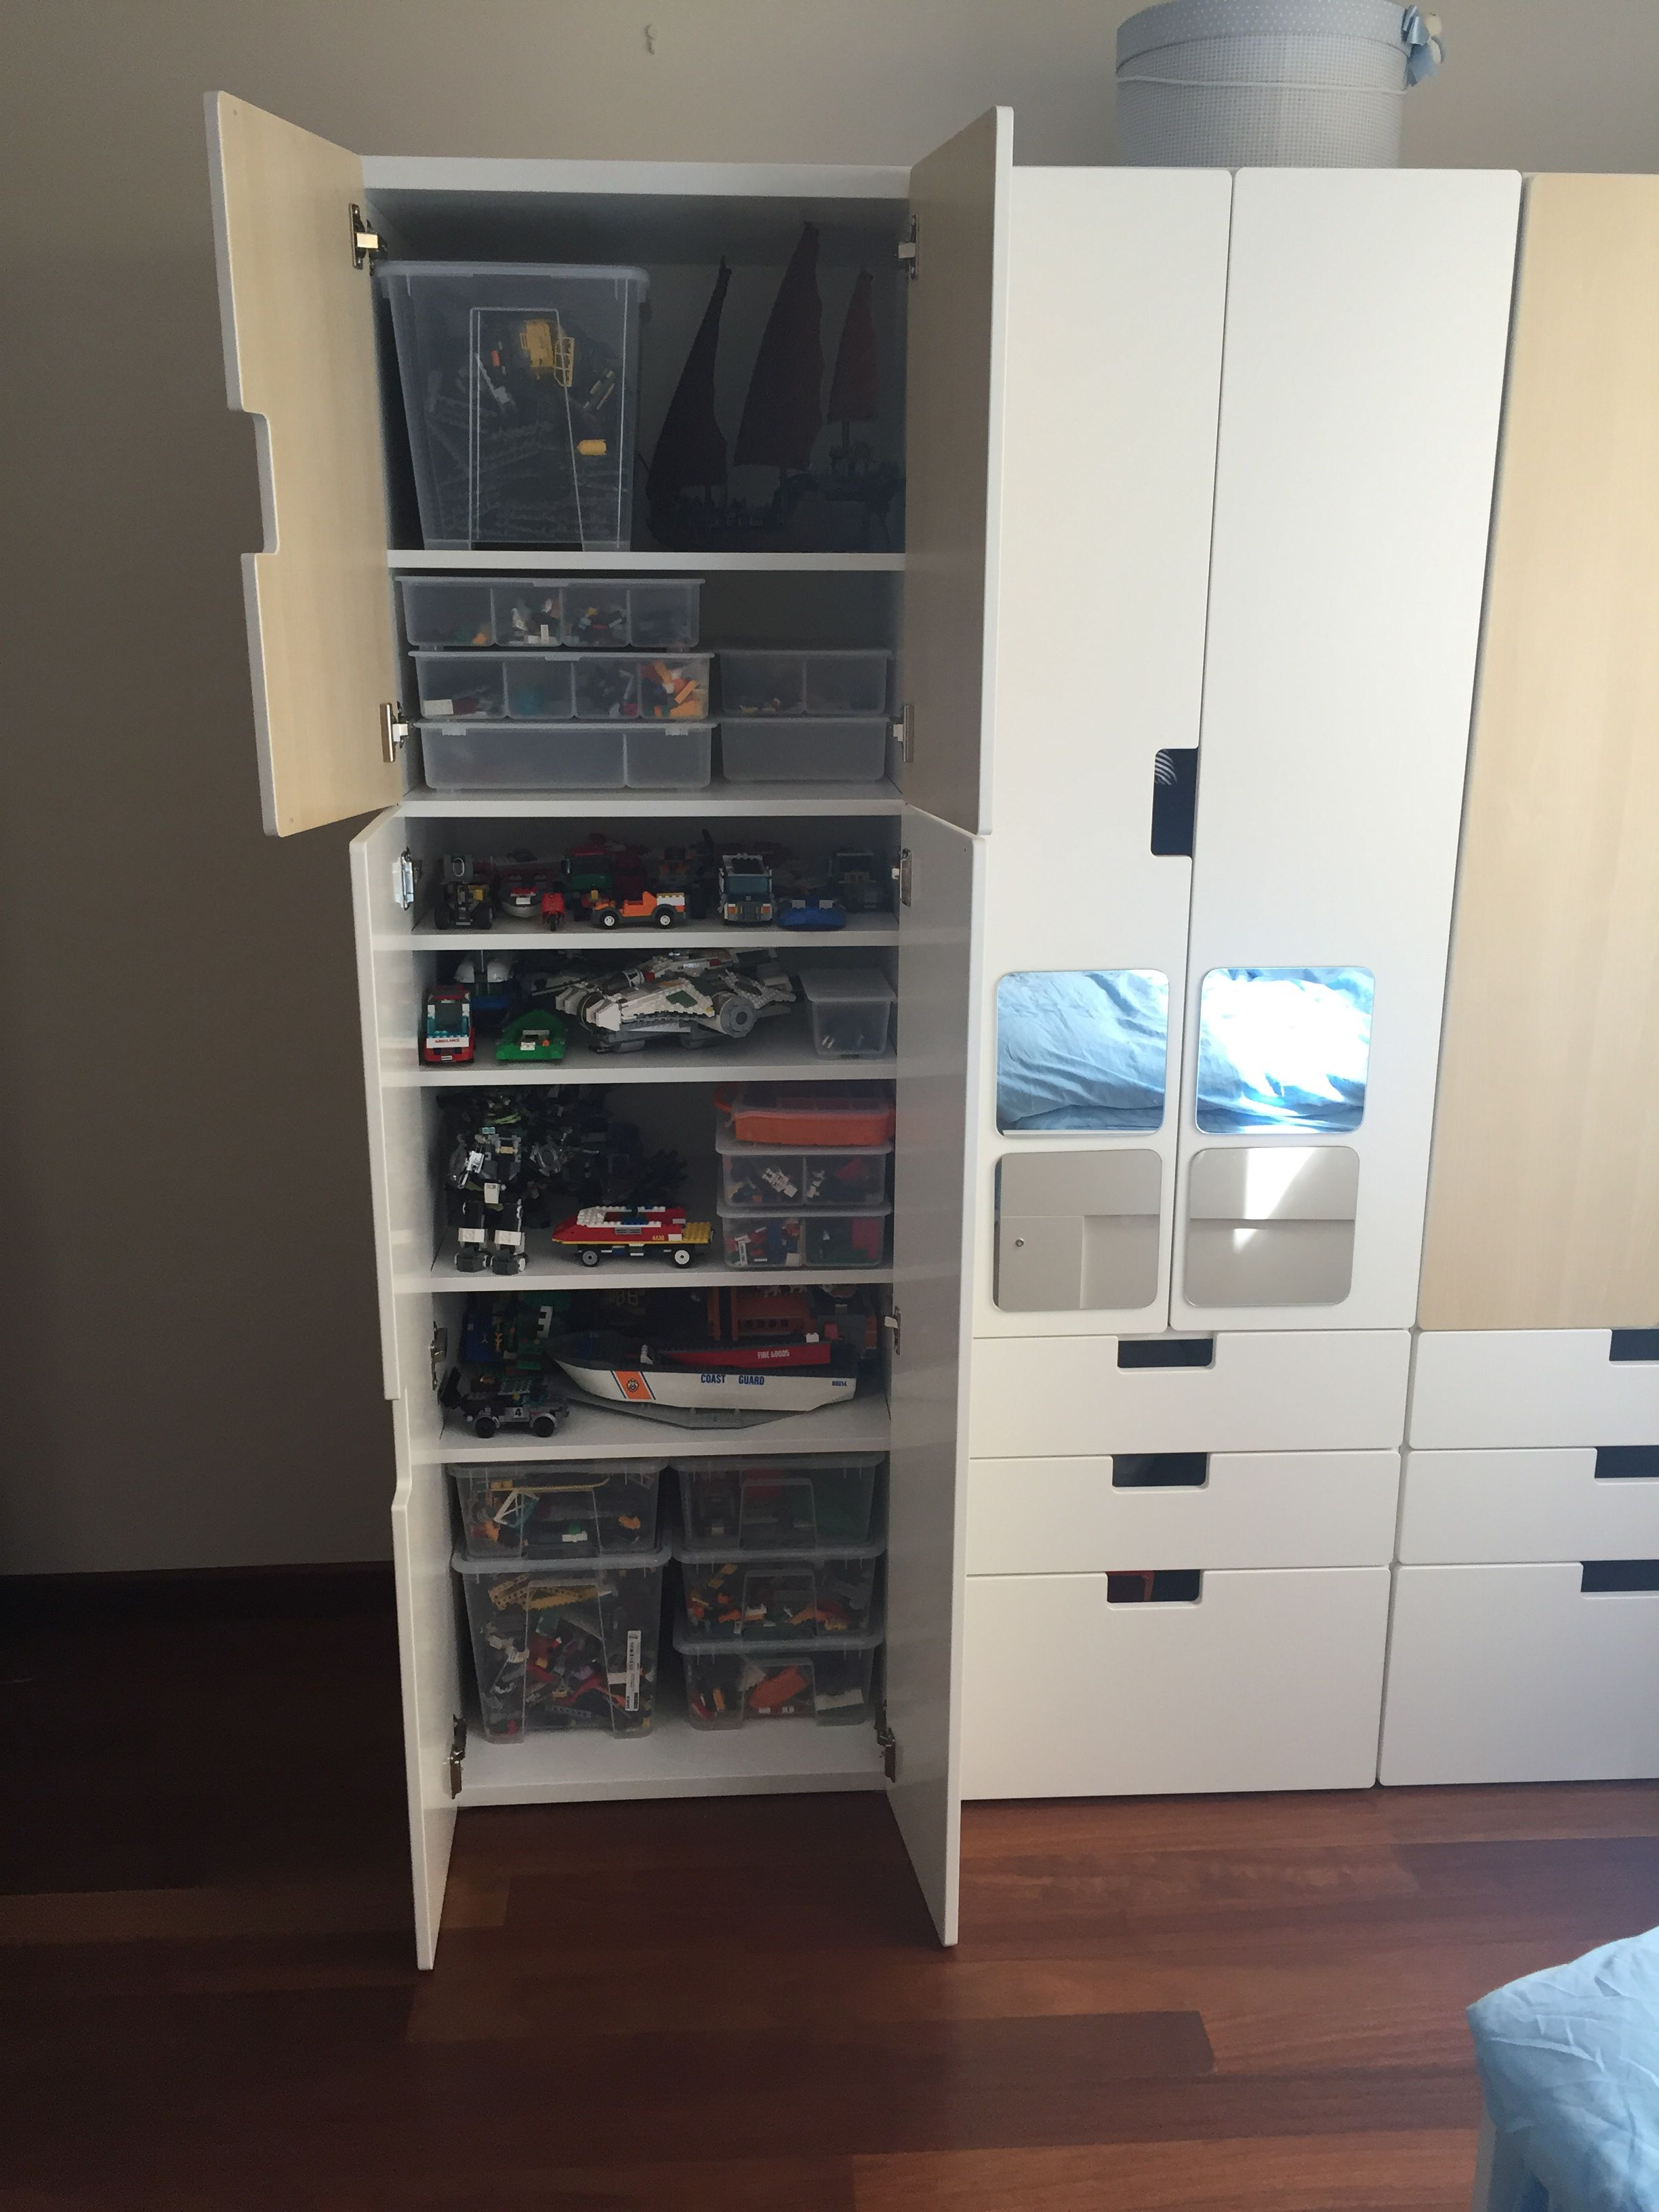 lego storage with ikea stuva lego stroge pinterest lego storage lego and storage. Black Bedroom Furniture Sets. Home Design Ideas